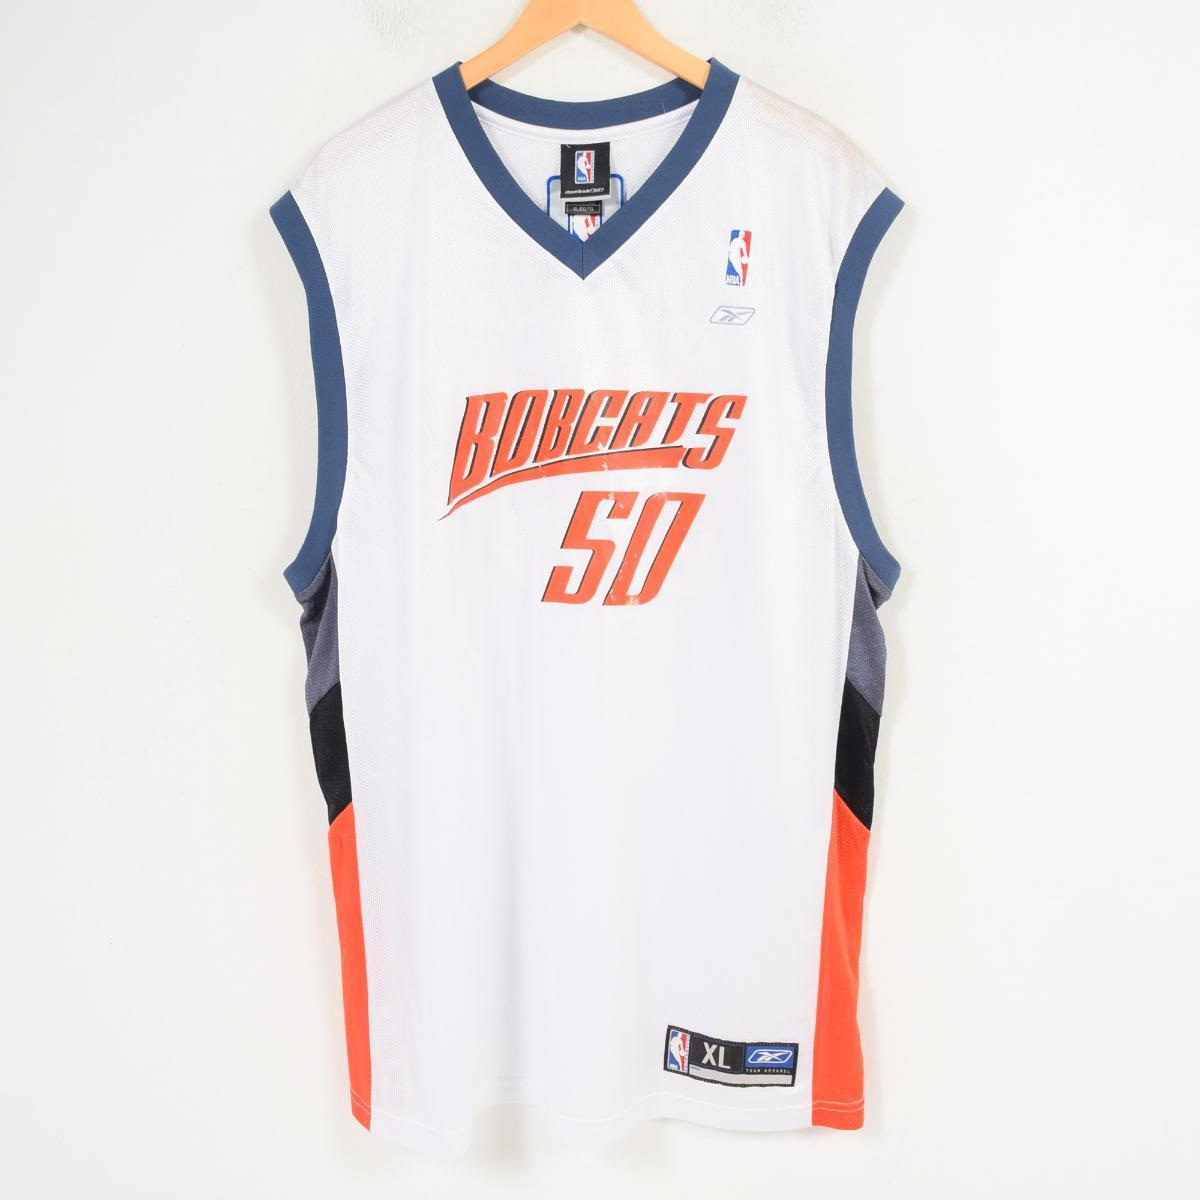 new styles fb338 60149 DEADSTOCK dead stock Reebok Reebok NBA CHARLOTTE BOBCSTS Charlotte Bobcats  game shirt replica uniform men XL /wap0662